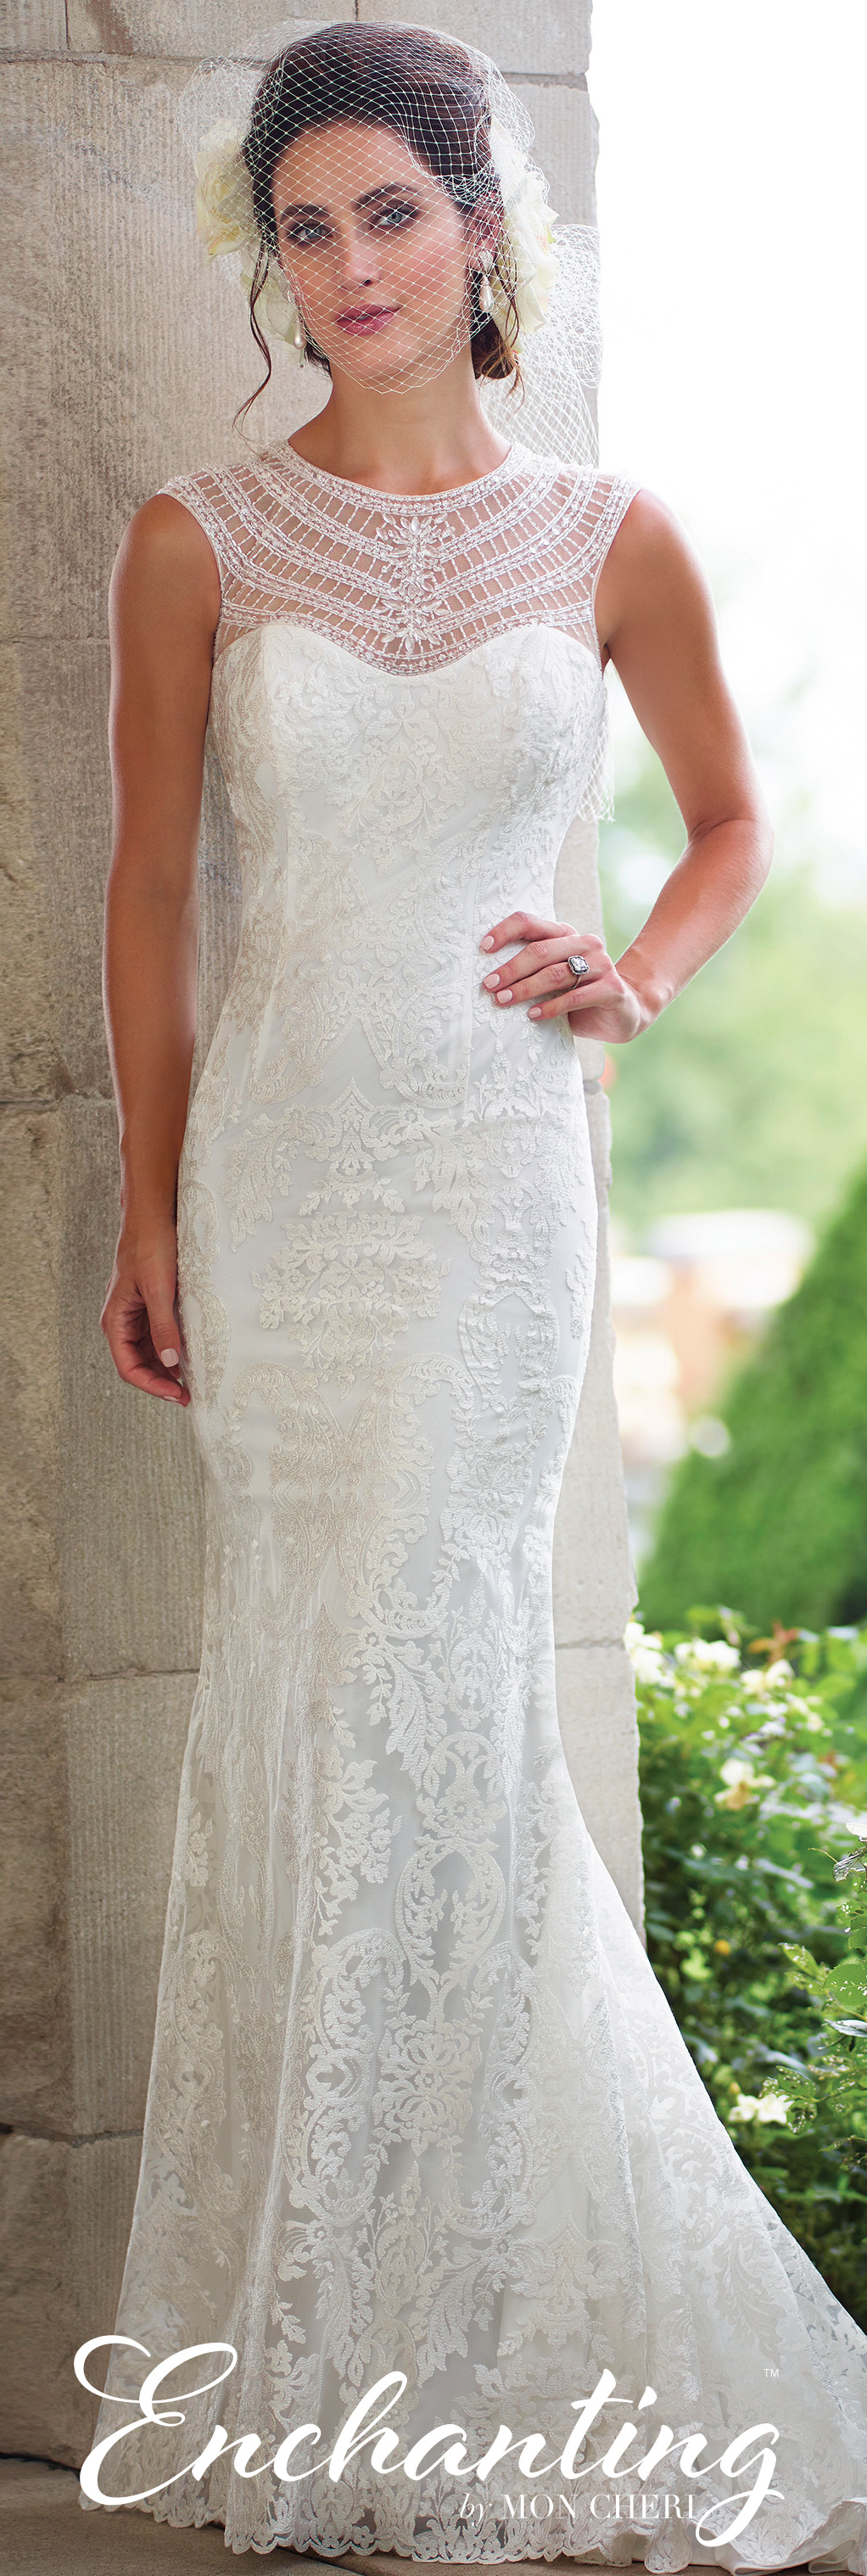 Modern wedding dresses by mon cheri trumpets wedding dress